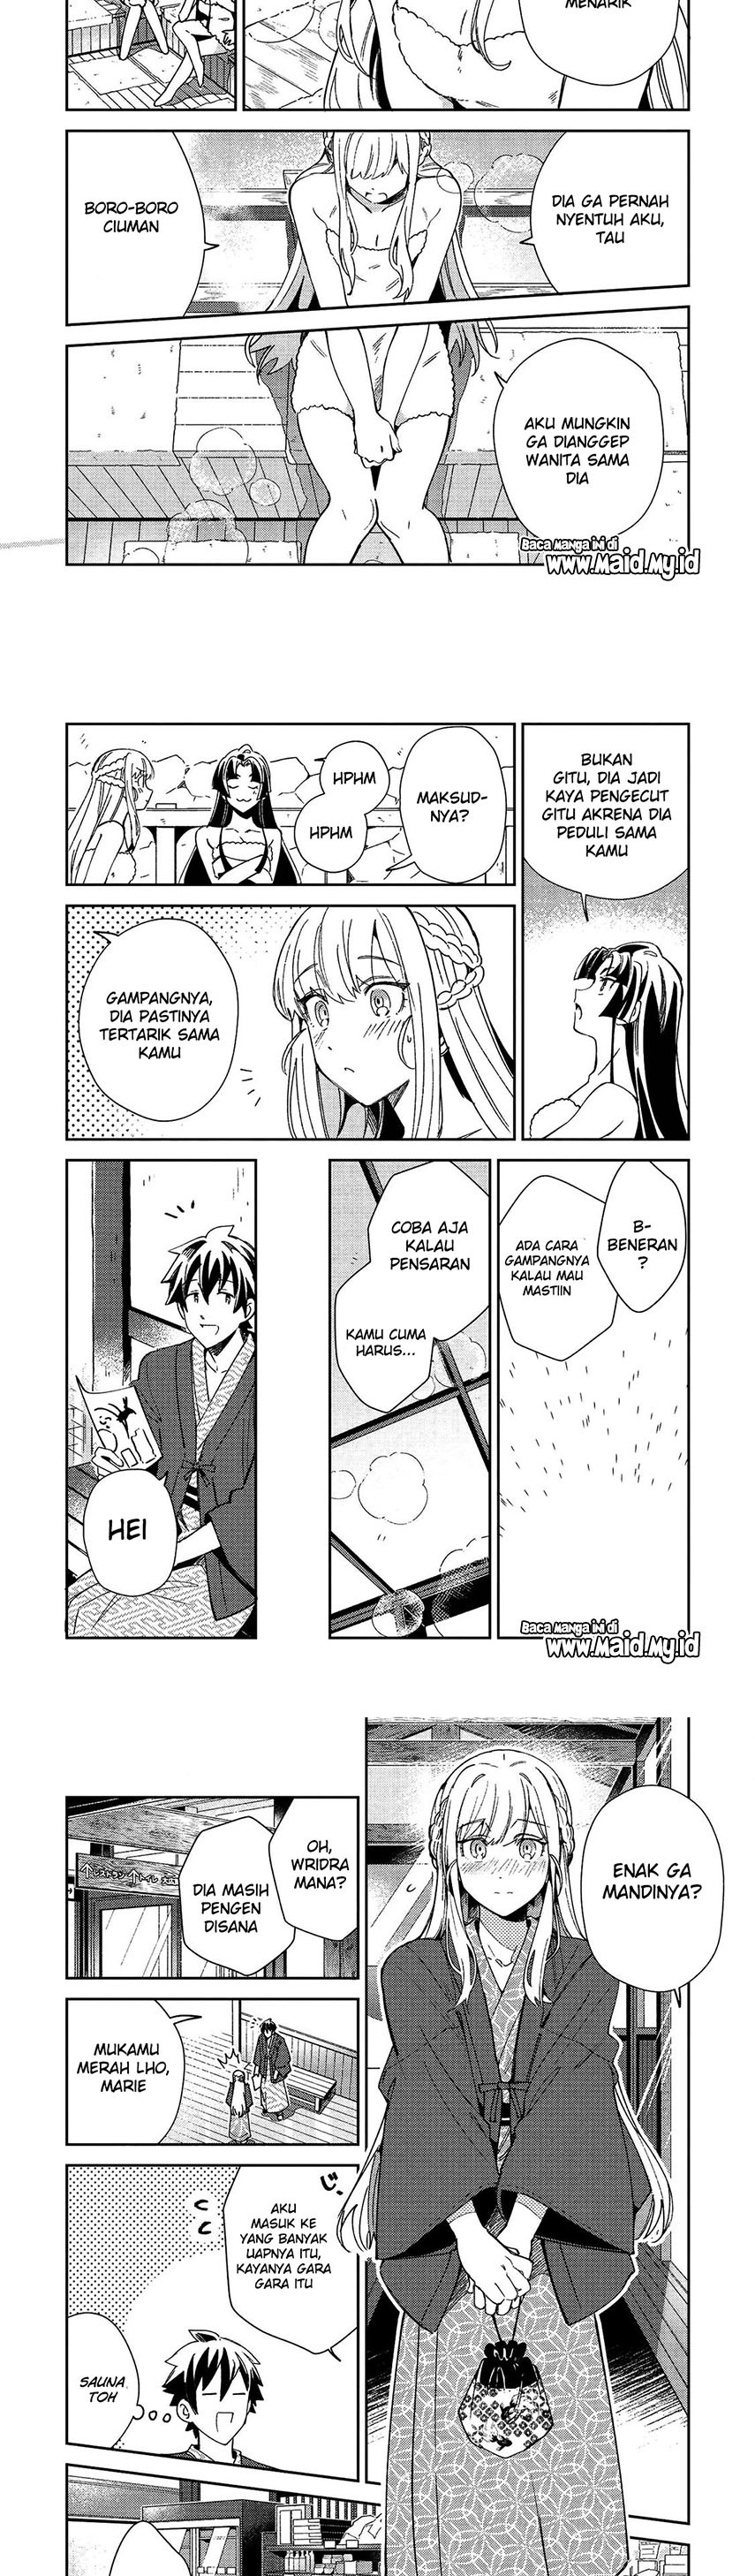 Nihon e Youkoso Elf-san.: Chapter 26 - Page 9